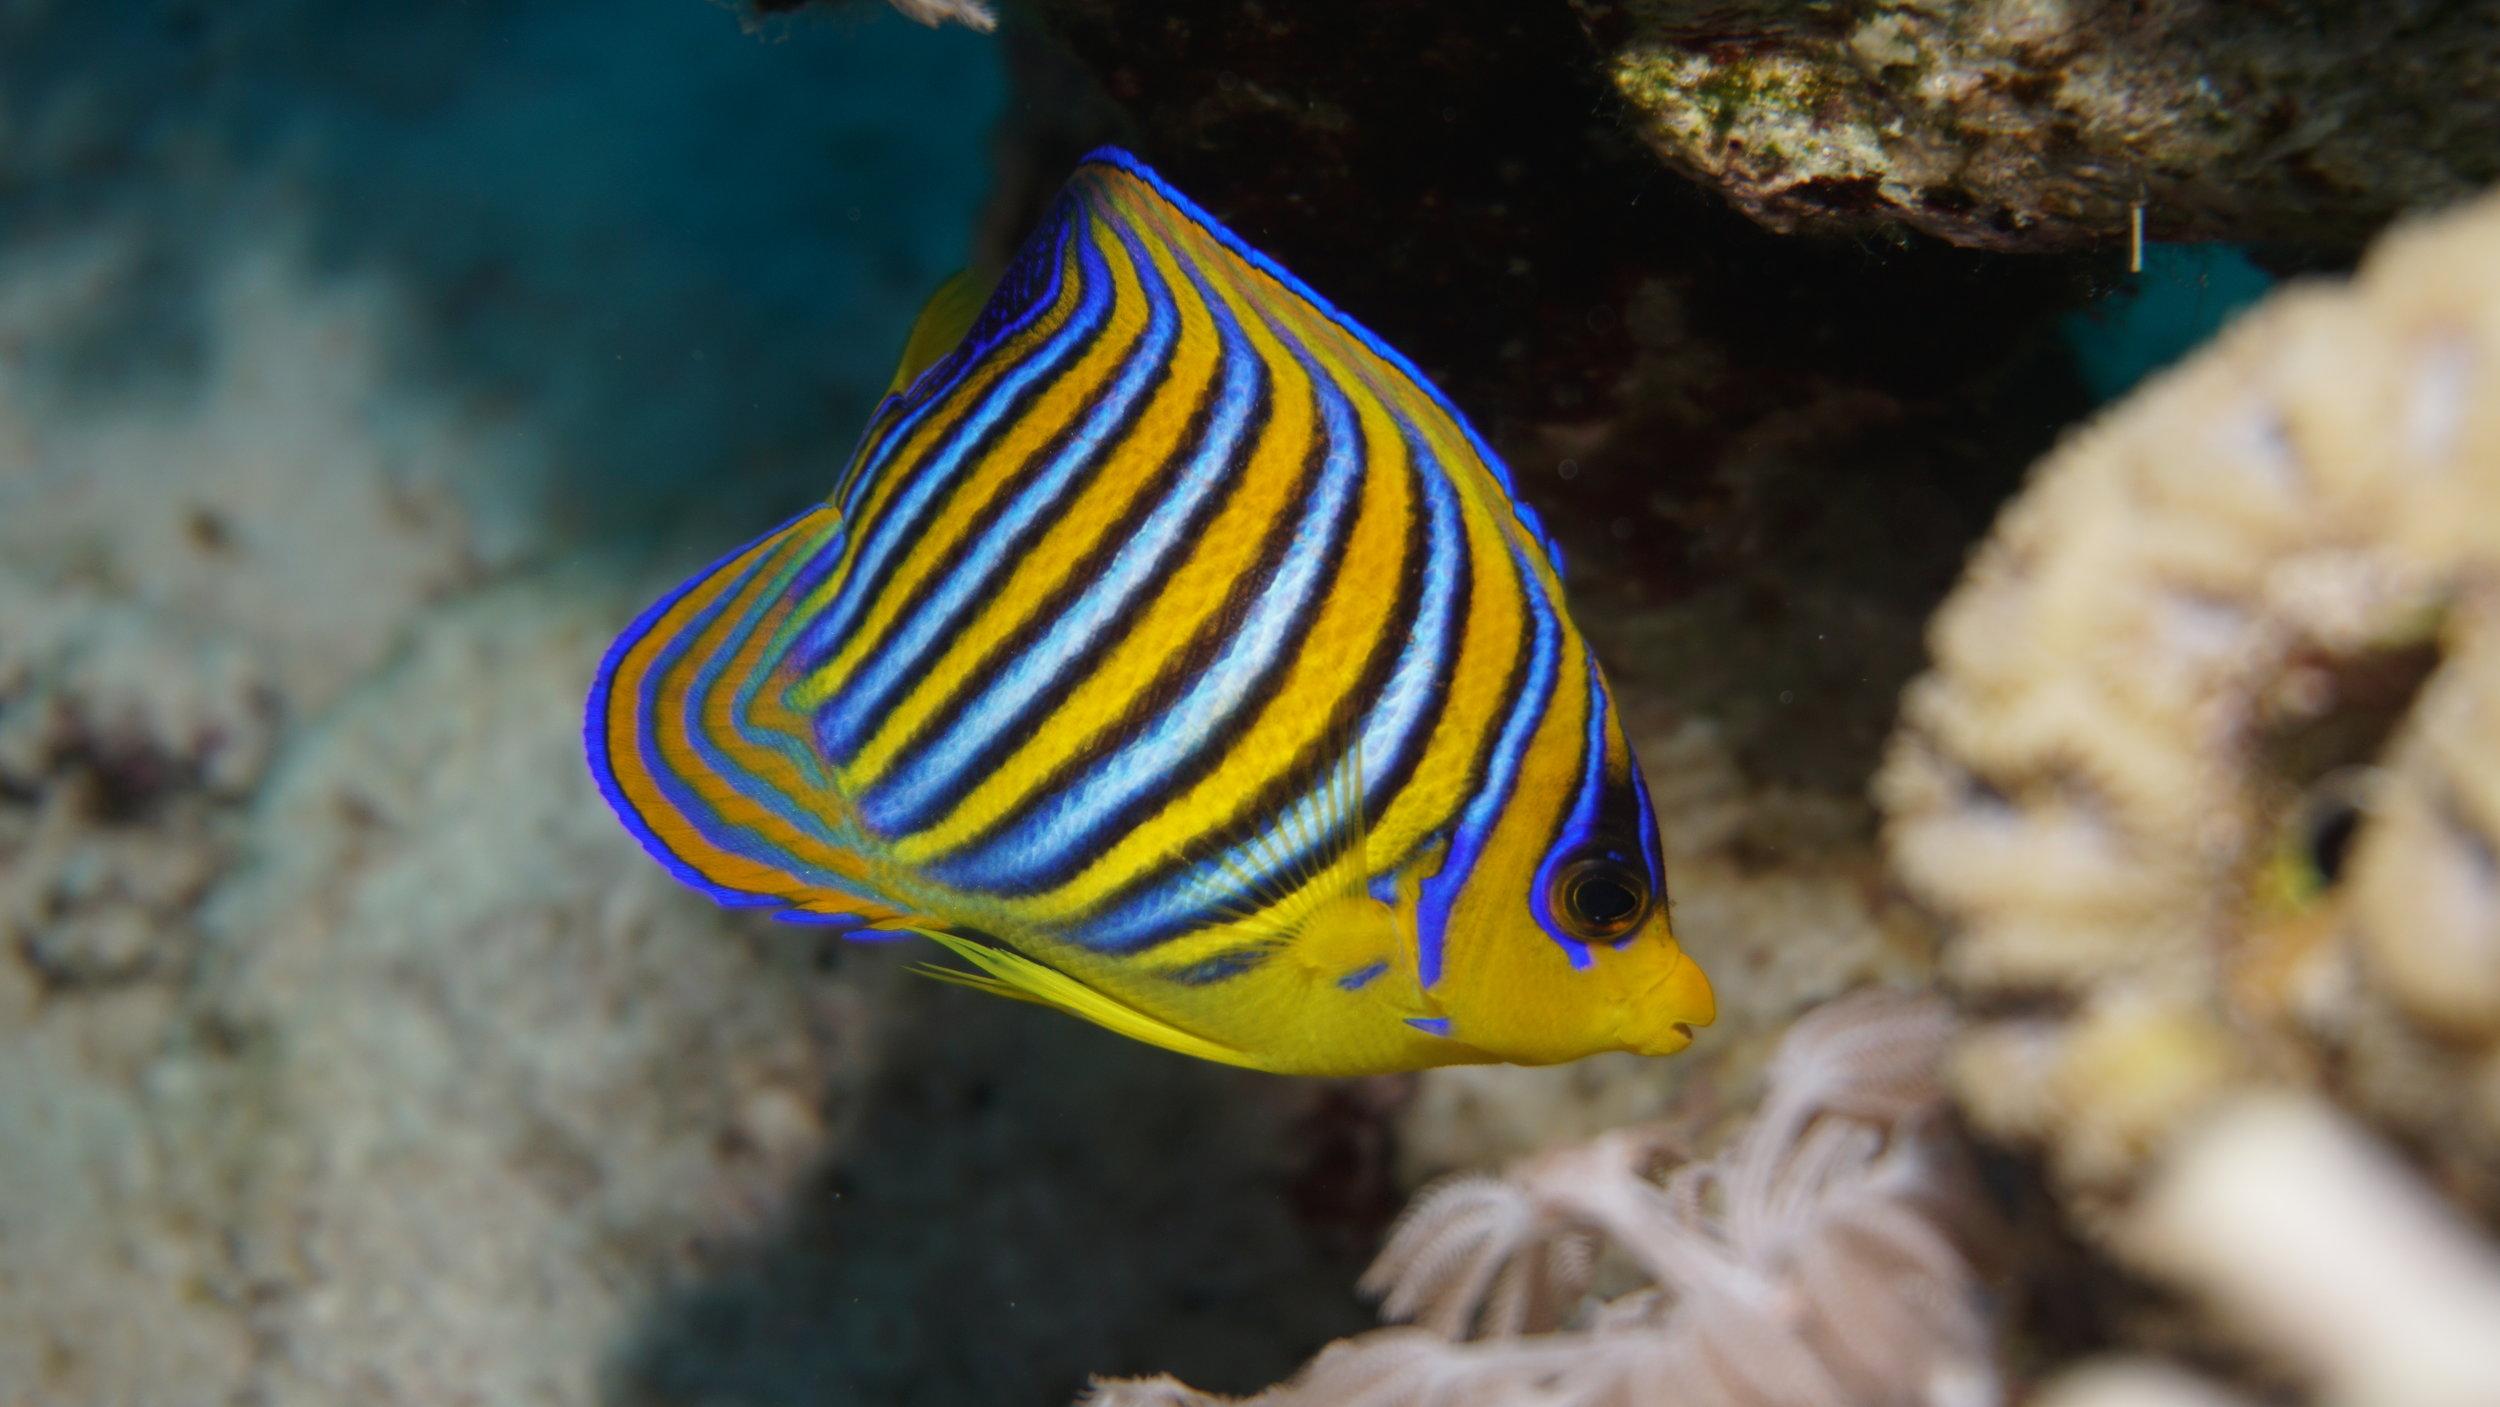 royal angel butterflyfish credit: Ceyhan Bekiroglu / coral reef image bank